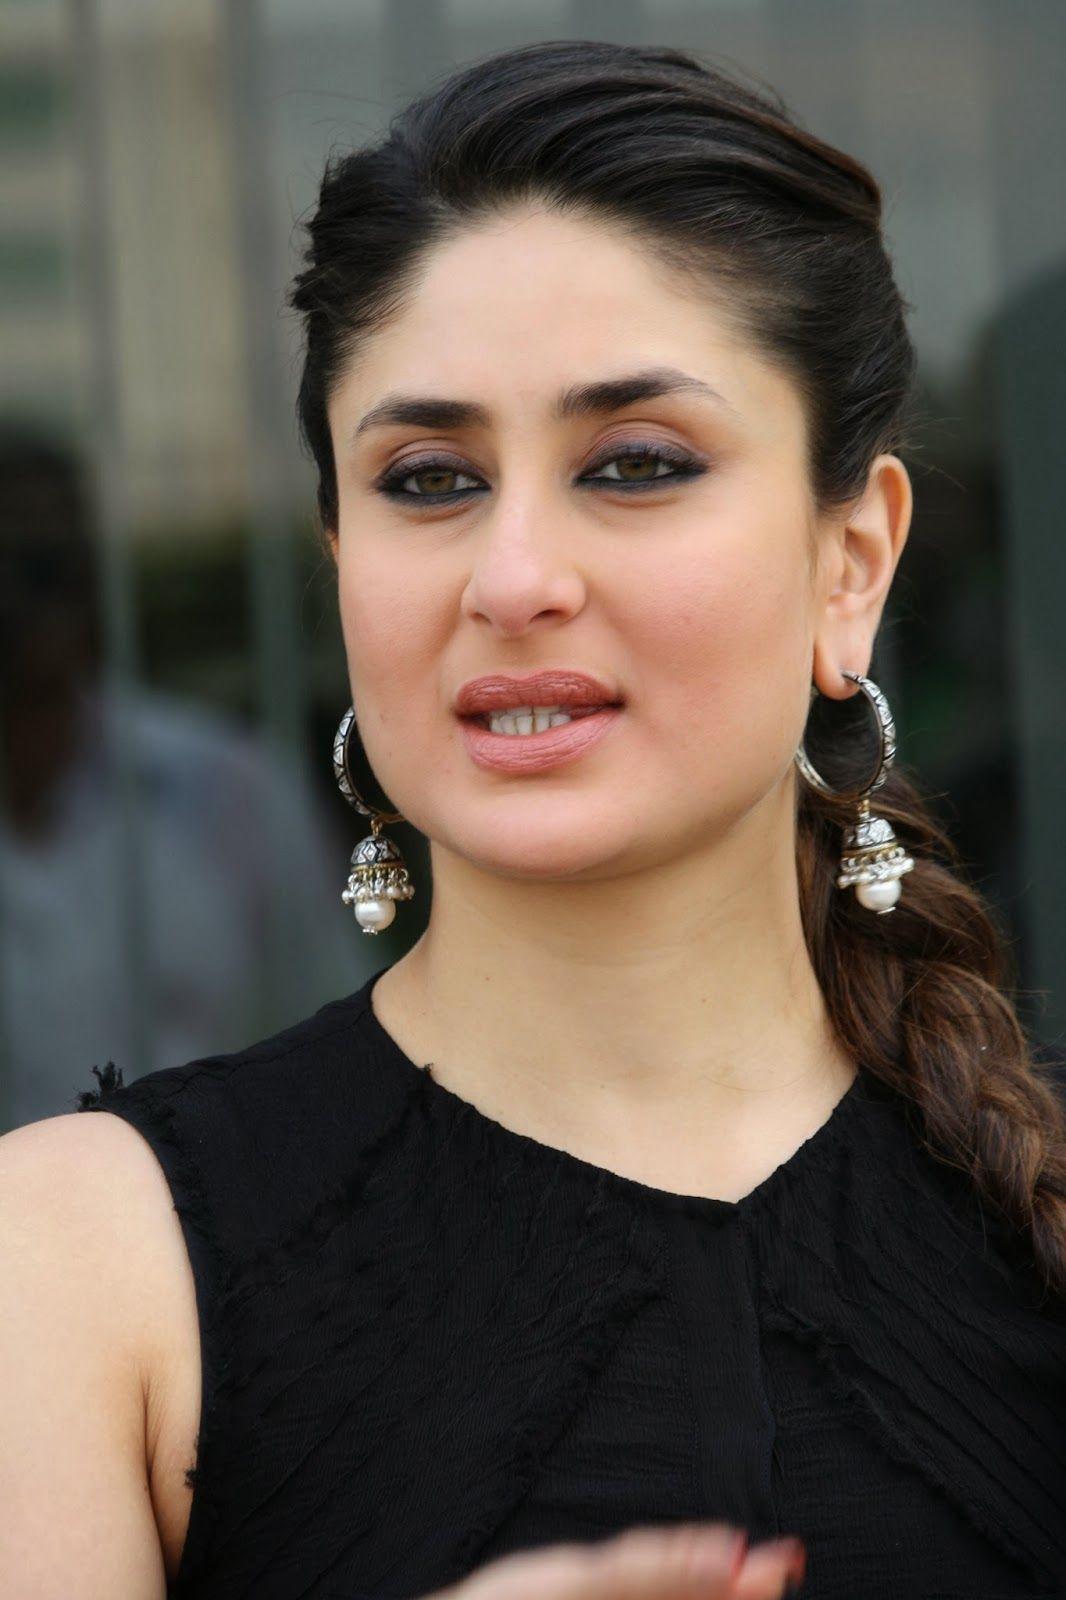 Black dress kareena kapoor - Glamorous Kareena Kapoor Photos In Black Dress